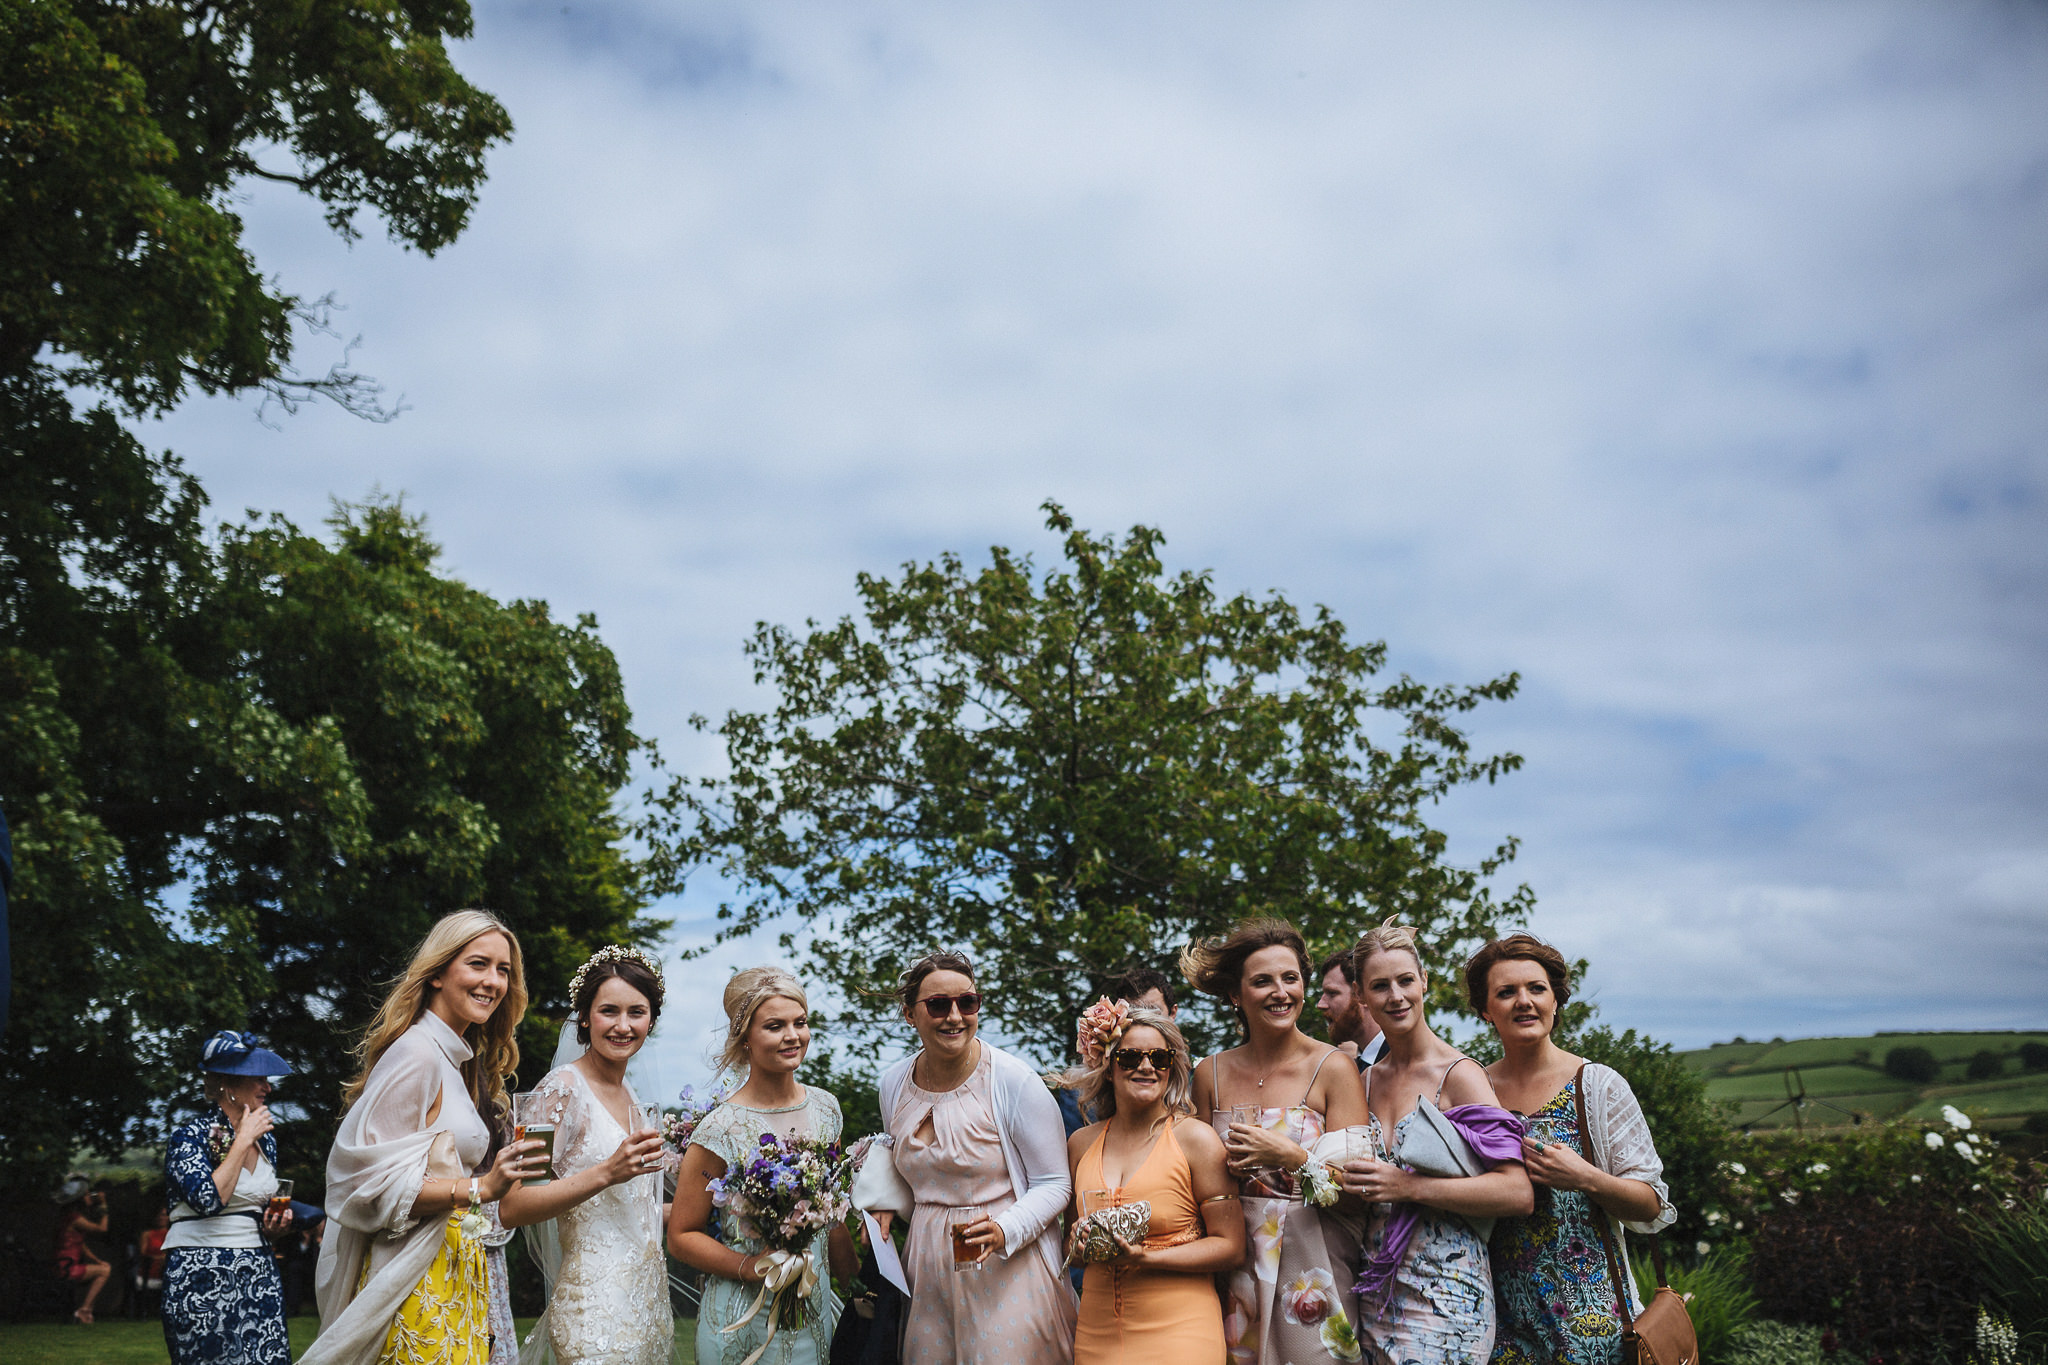 paul-marbrook-Farm-Wedding-Photographer-Lancashire-90041